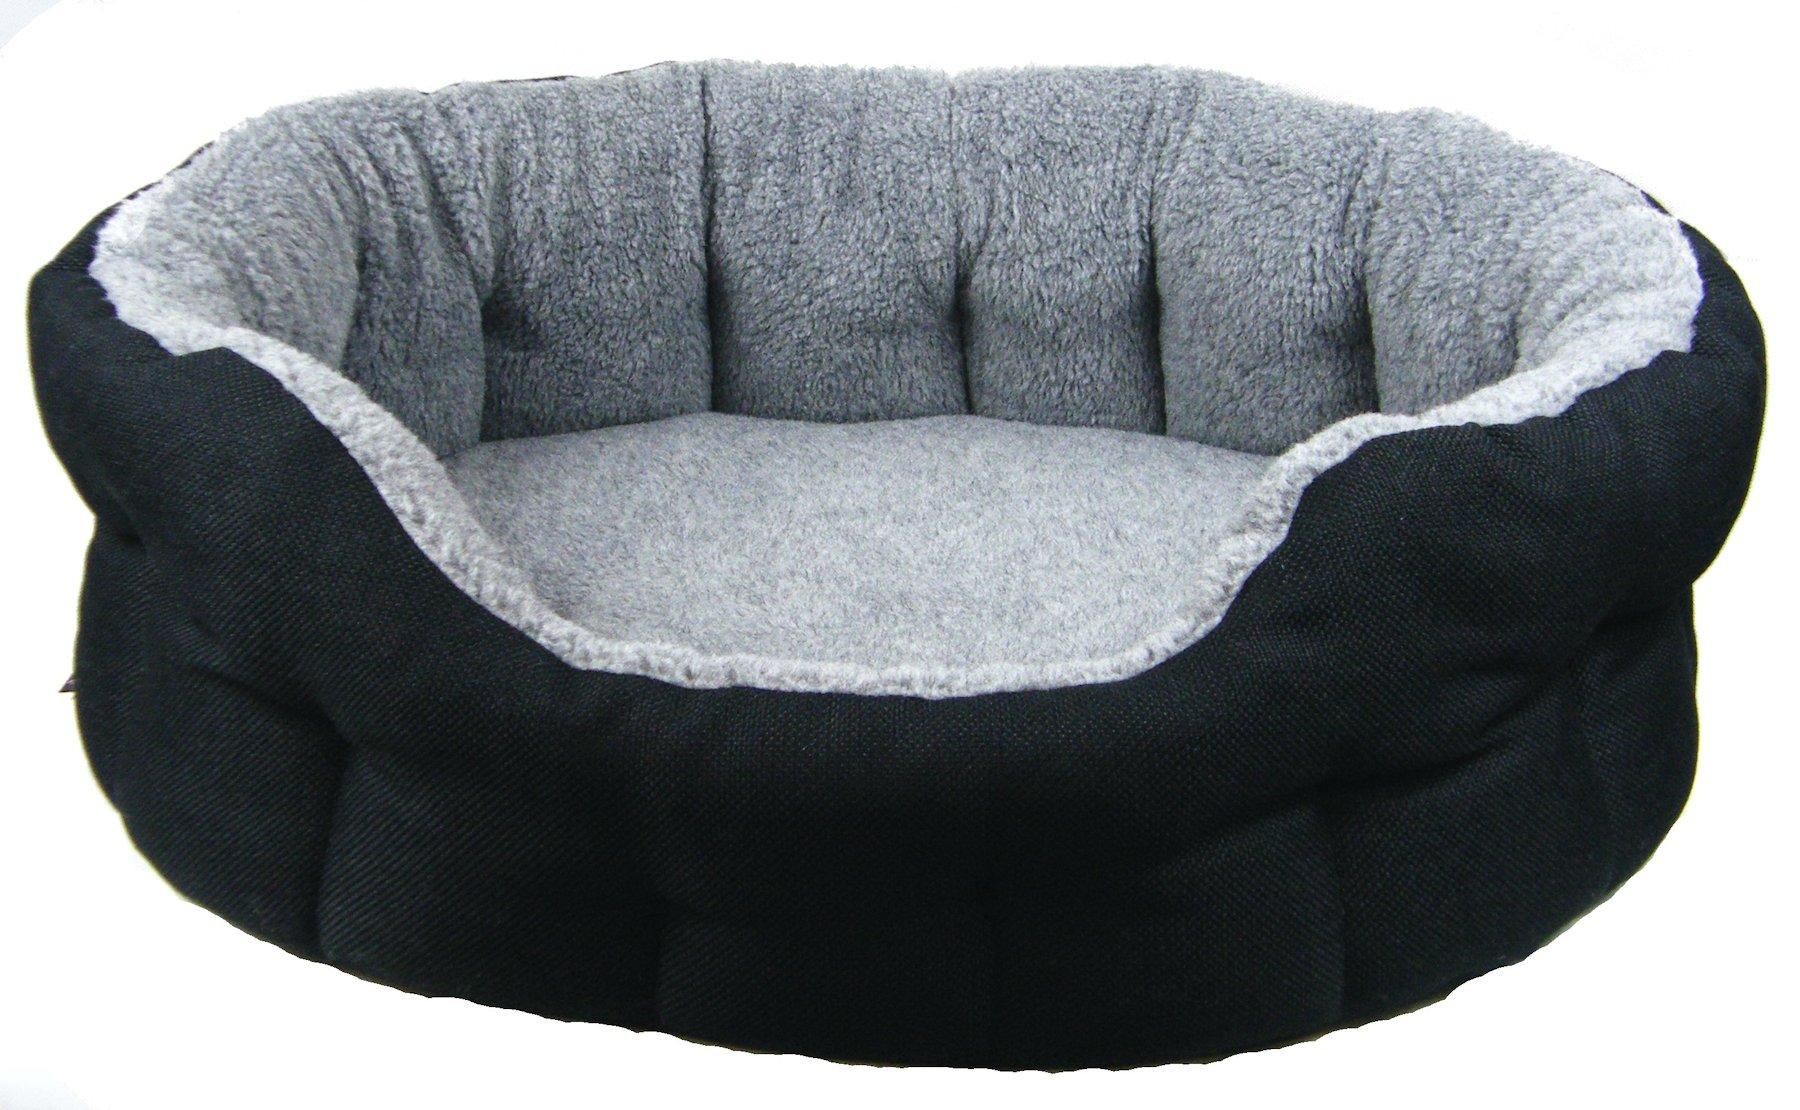 Basket Weave and Fleece Puppy Beds Black